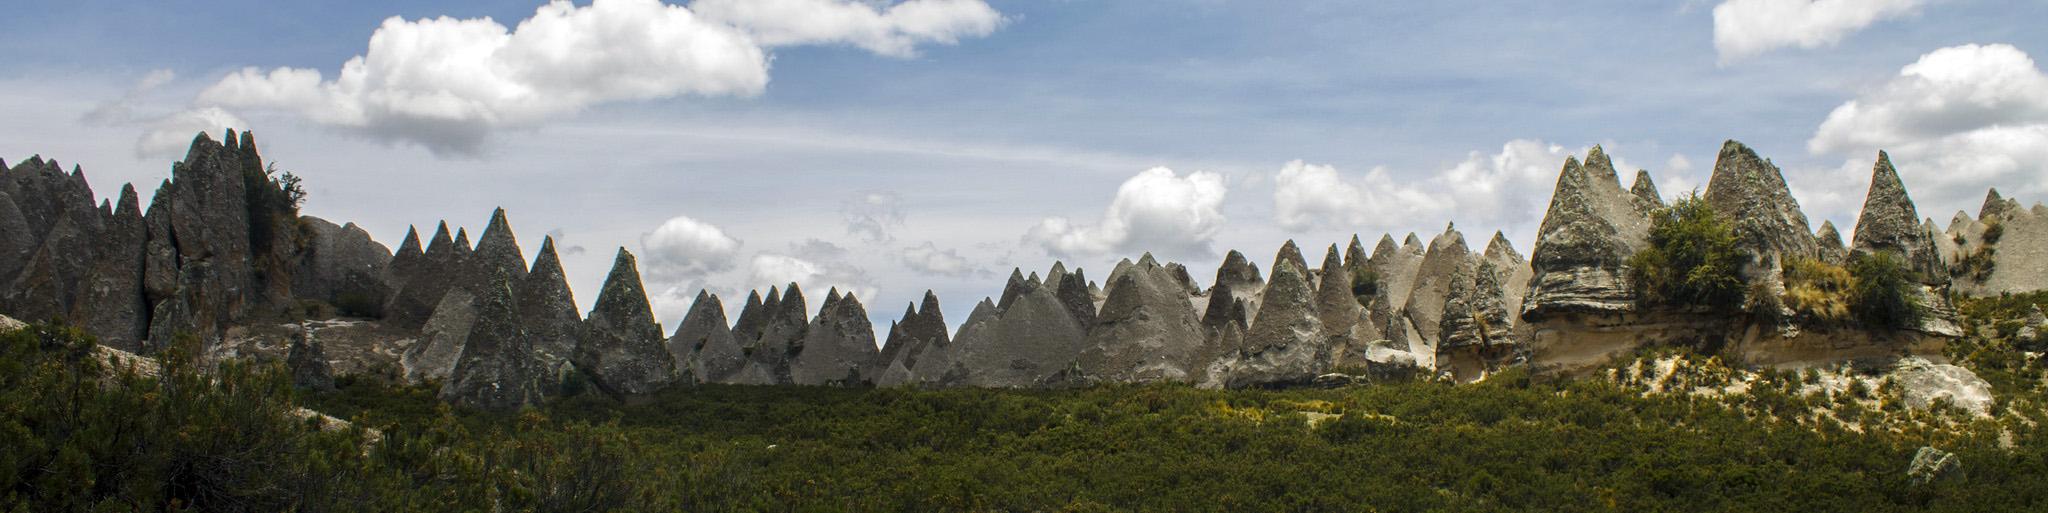 pampachiri bosque de piedra